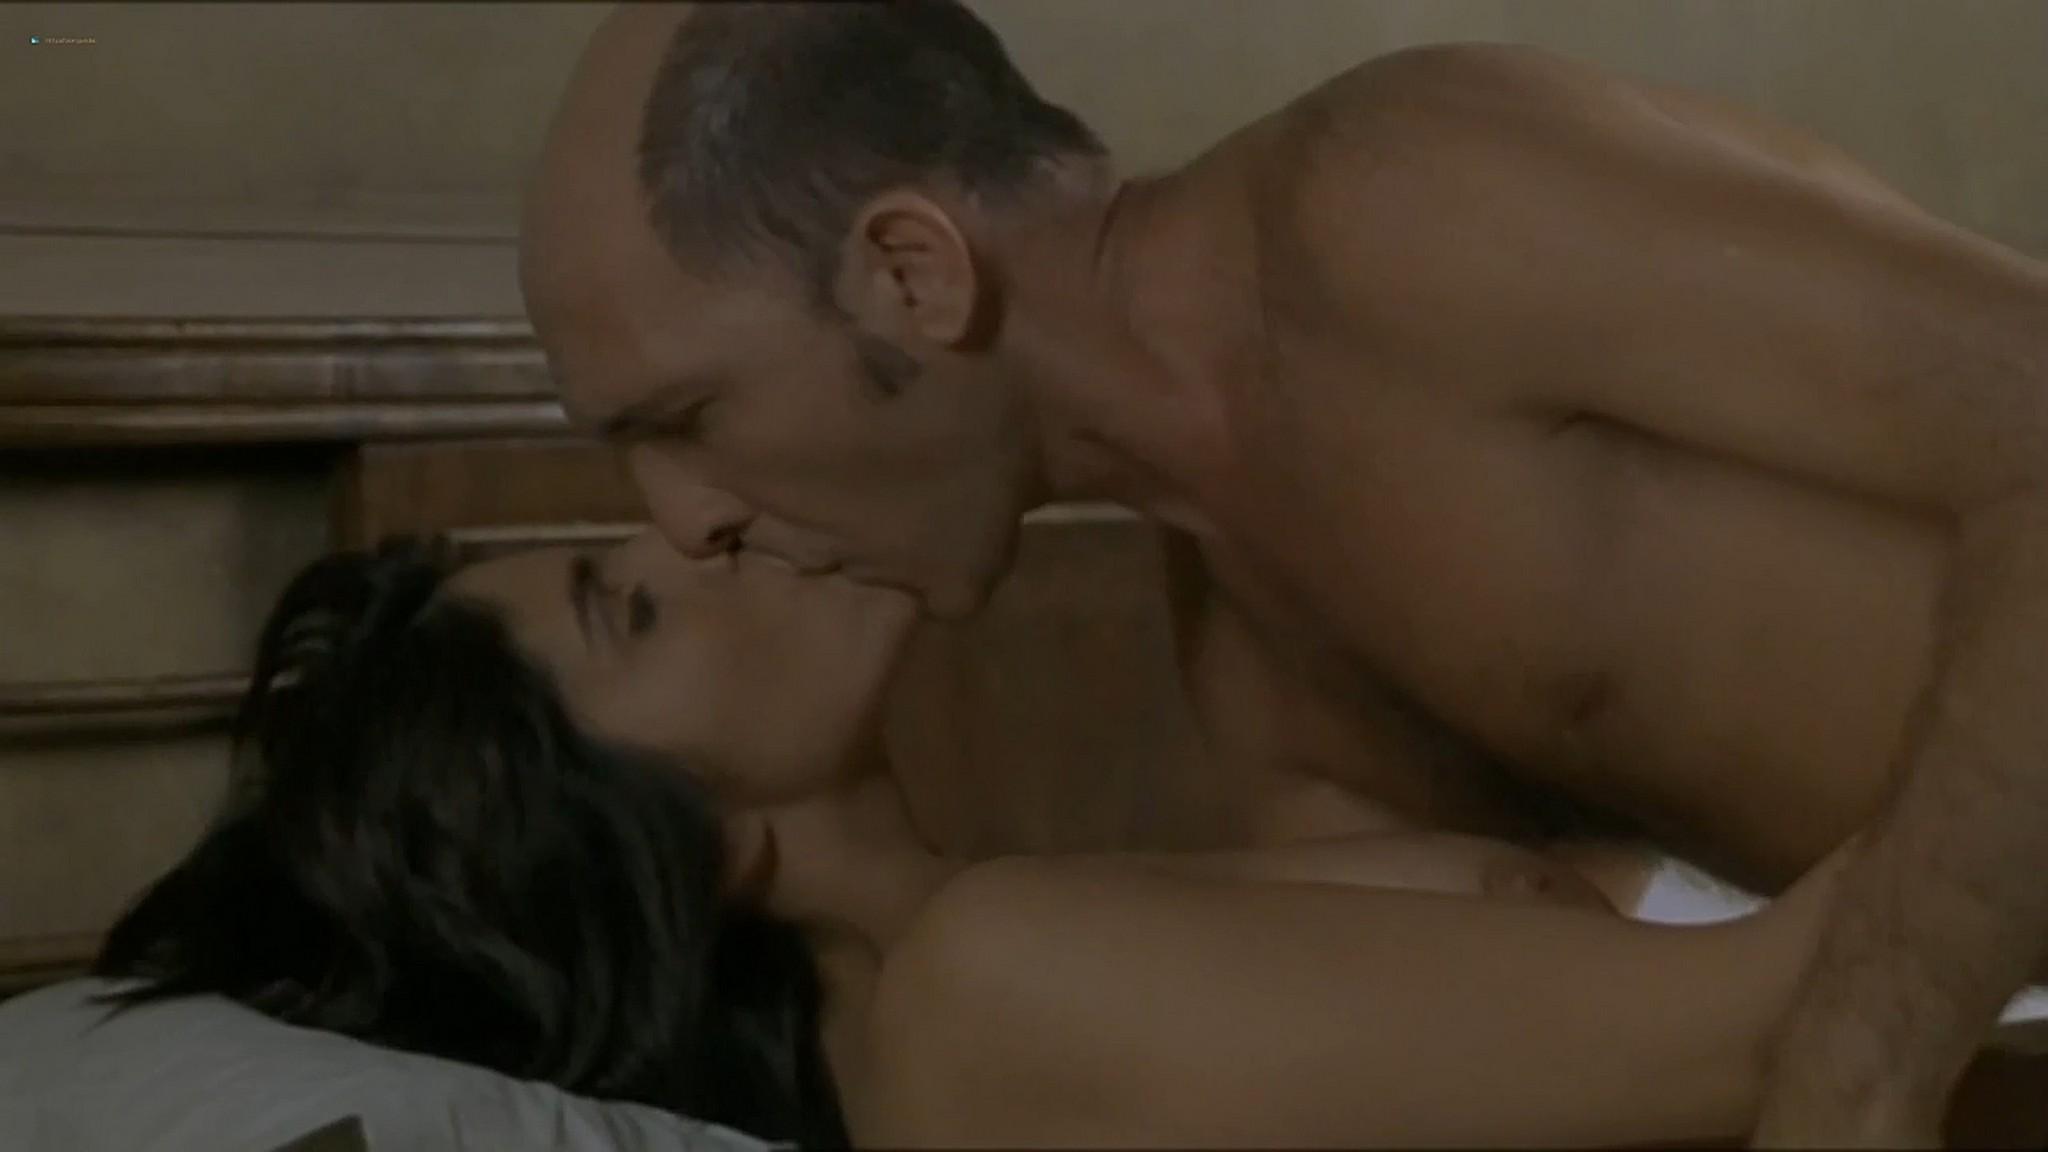 Ariadna Gil nude sex Sandra Ballesteros and other nude and sex El lado oscuro del corazon 2 AR 2001 720p 7